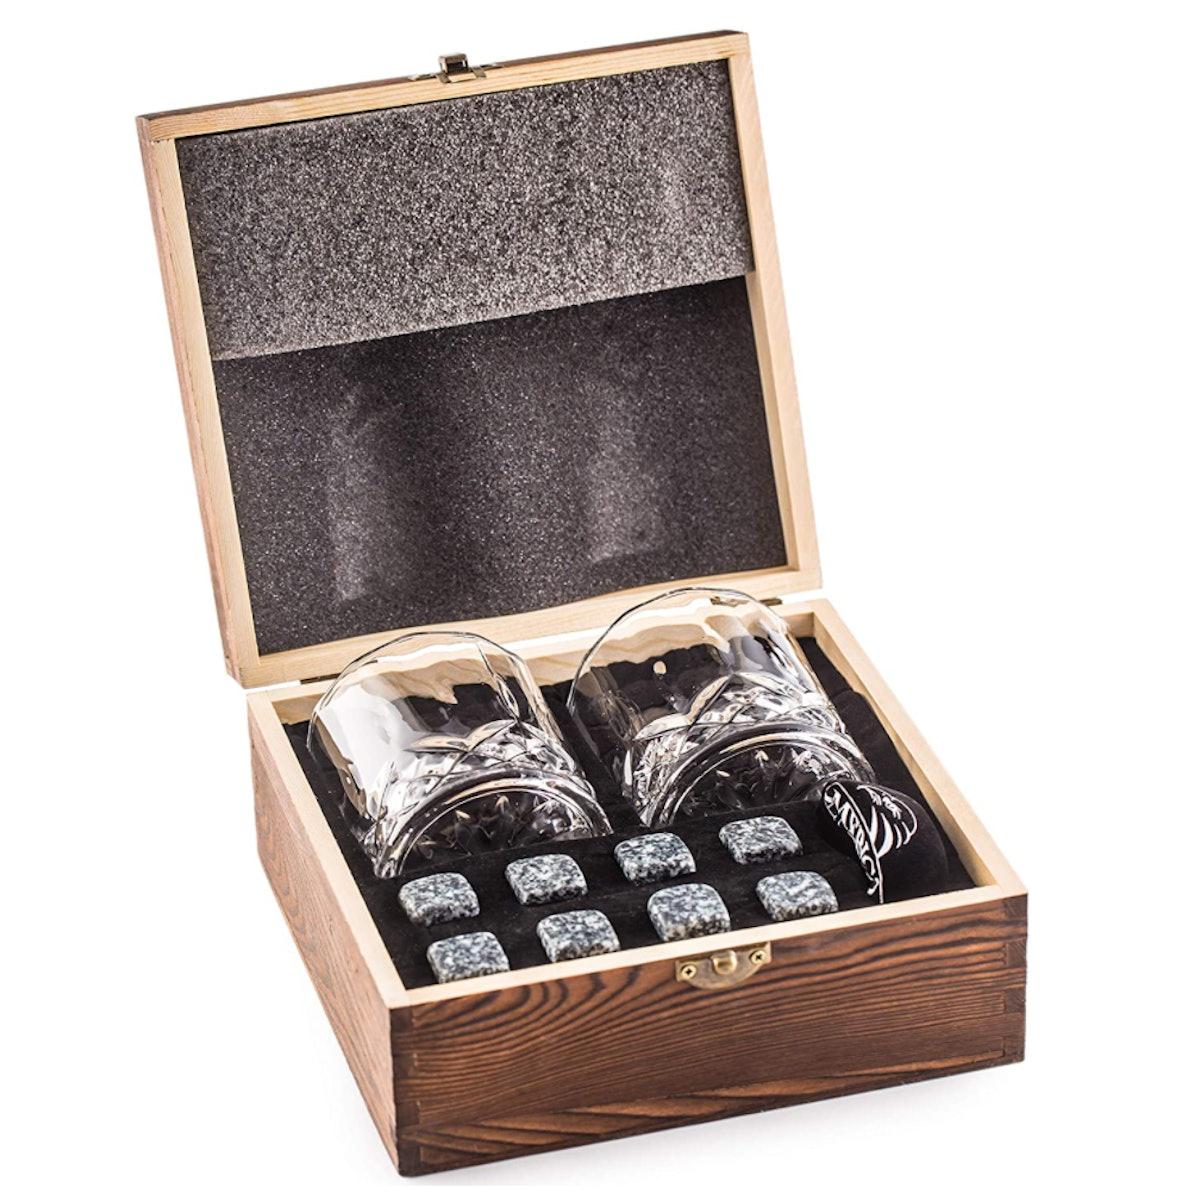 Whiskey Glasses and Stones Gift Set